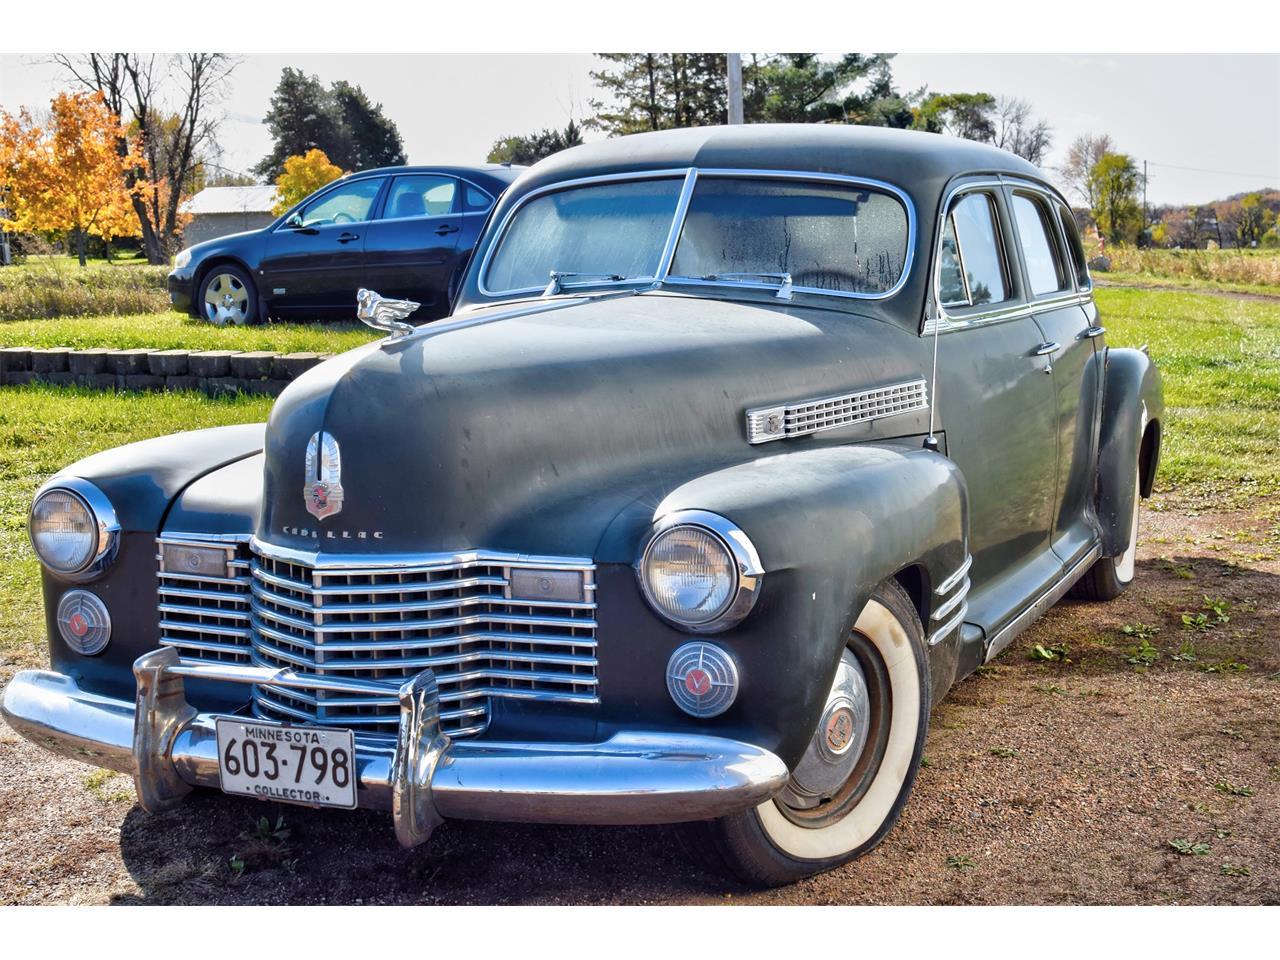 Cadillac Series 63 1941 prix tout compris 1941